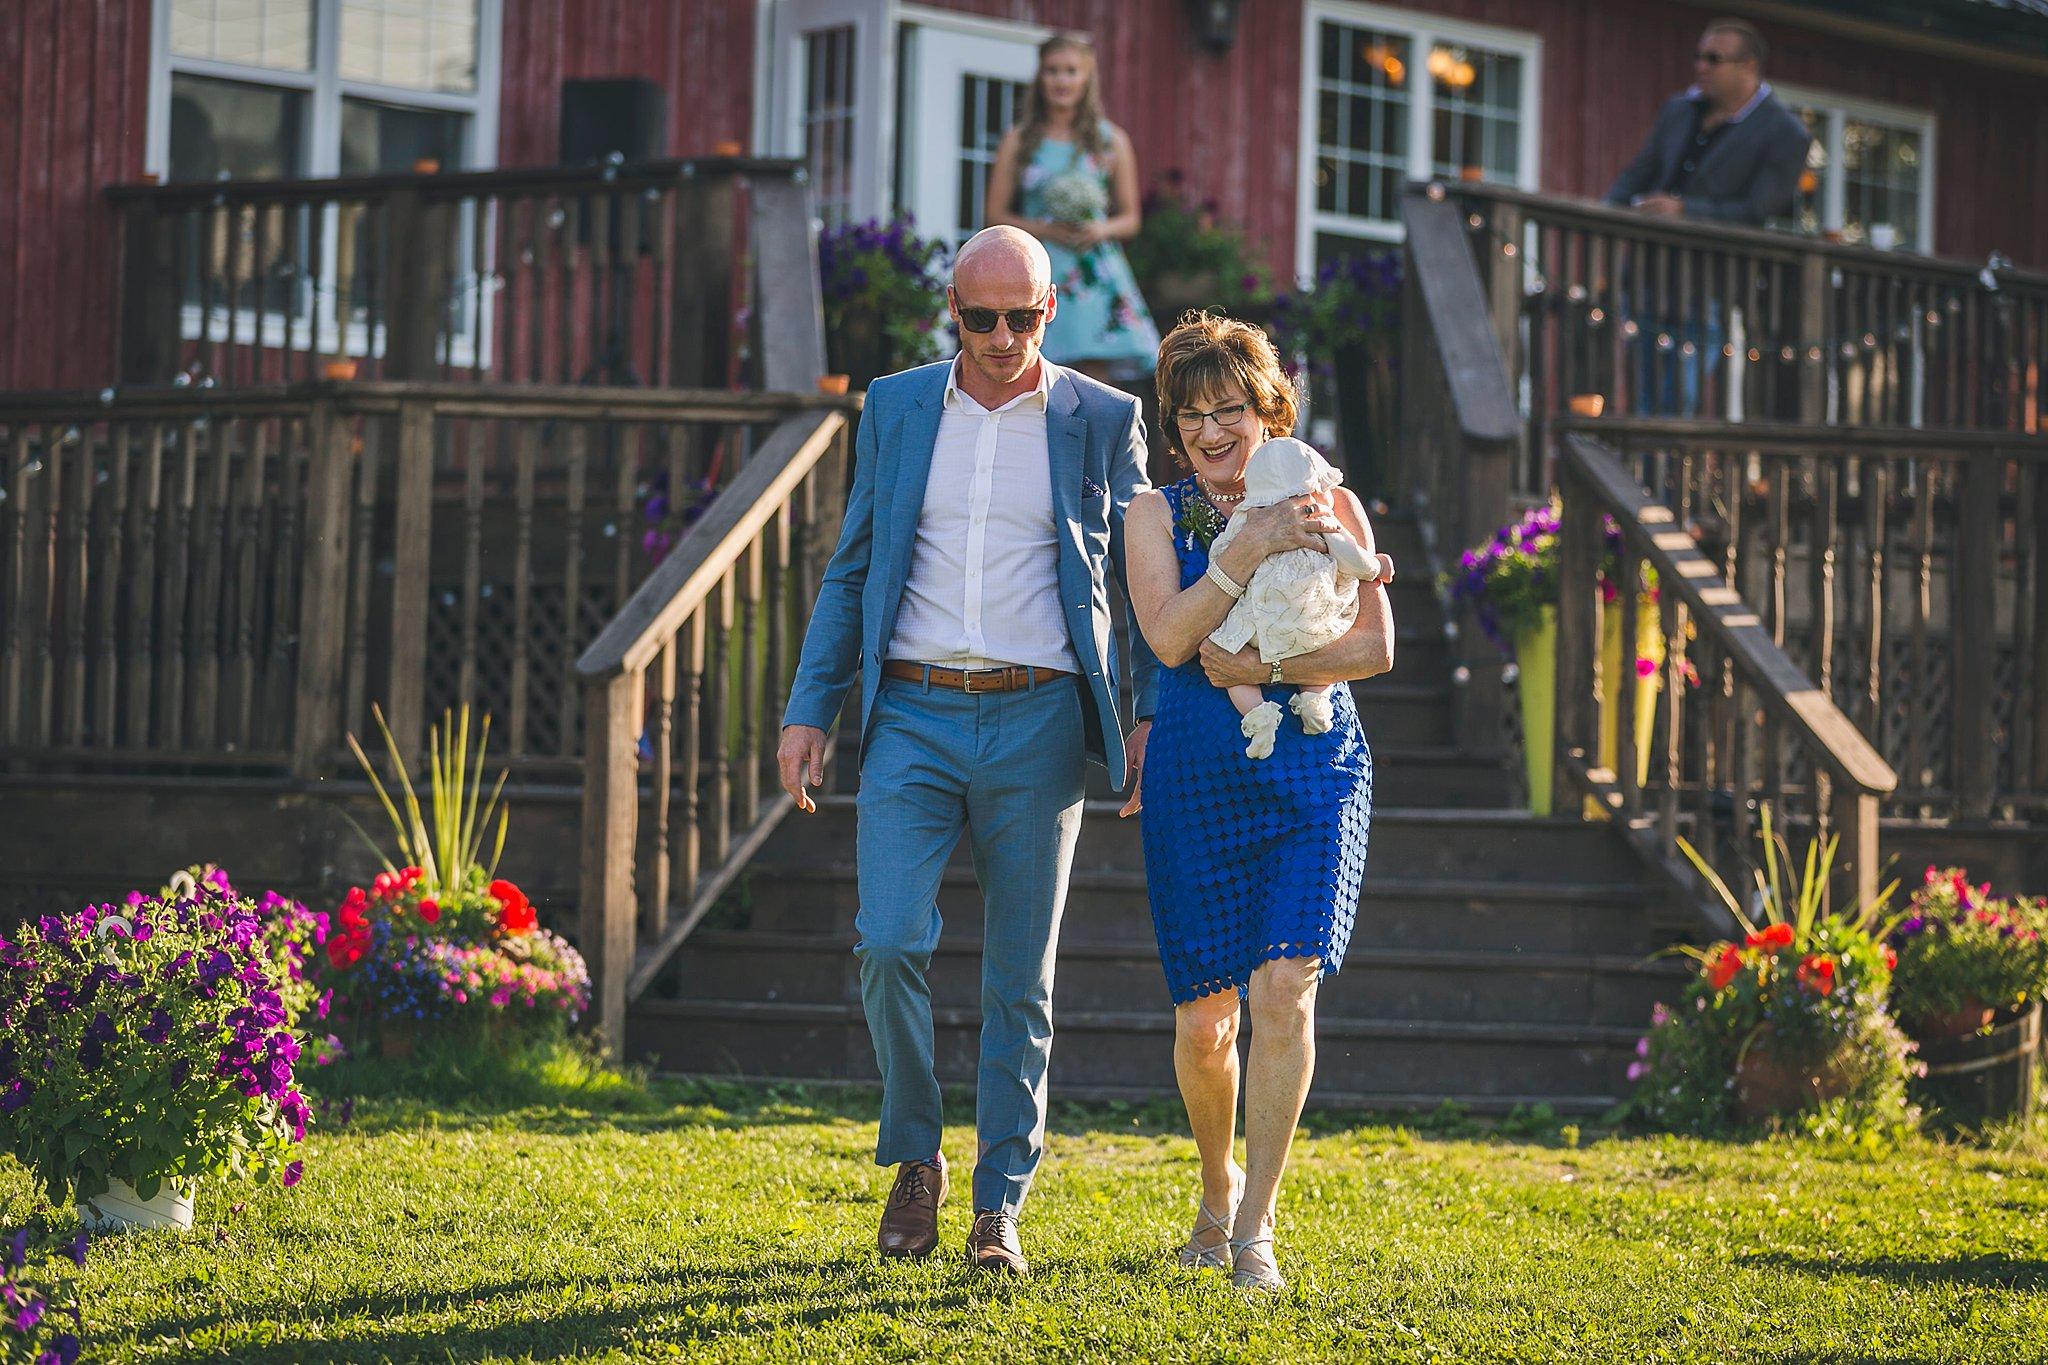 Wedding held at Lester's Farm in St. John's, Newfoundland